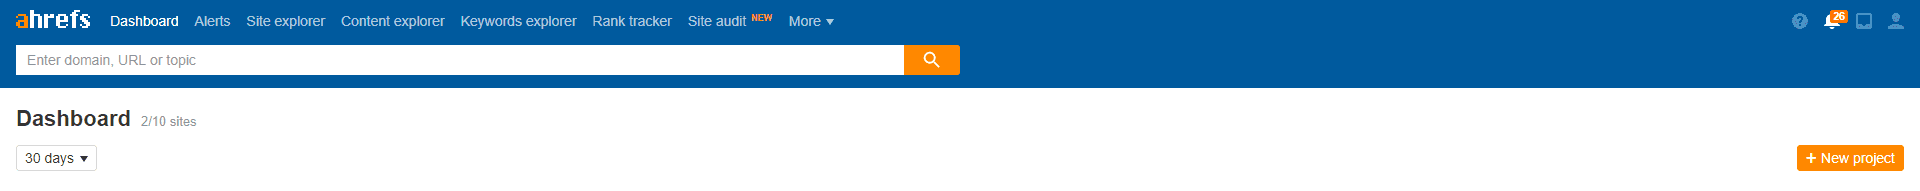 ahrefs dashboard image